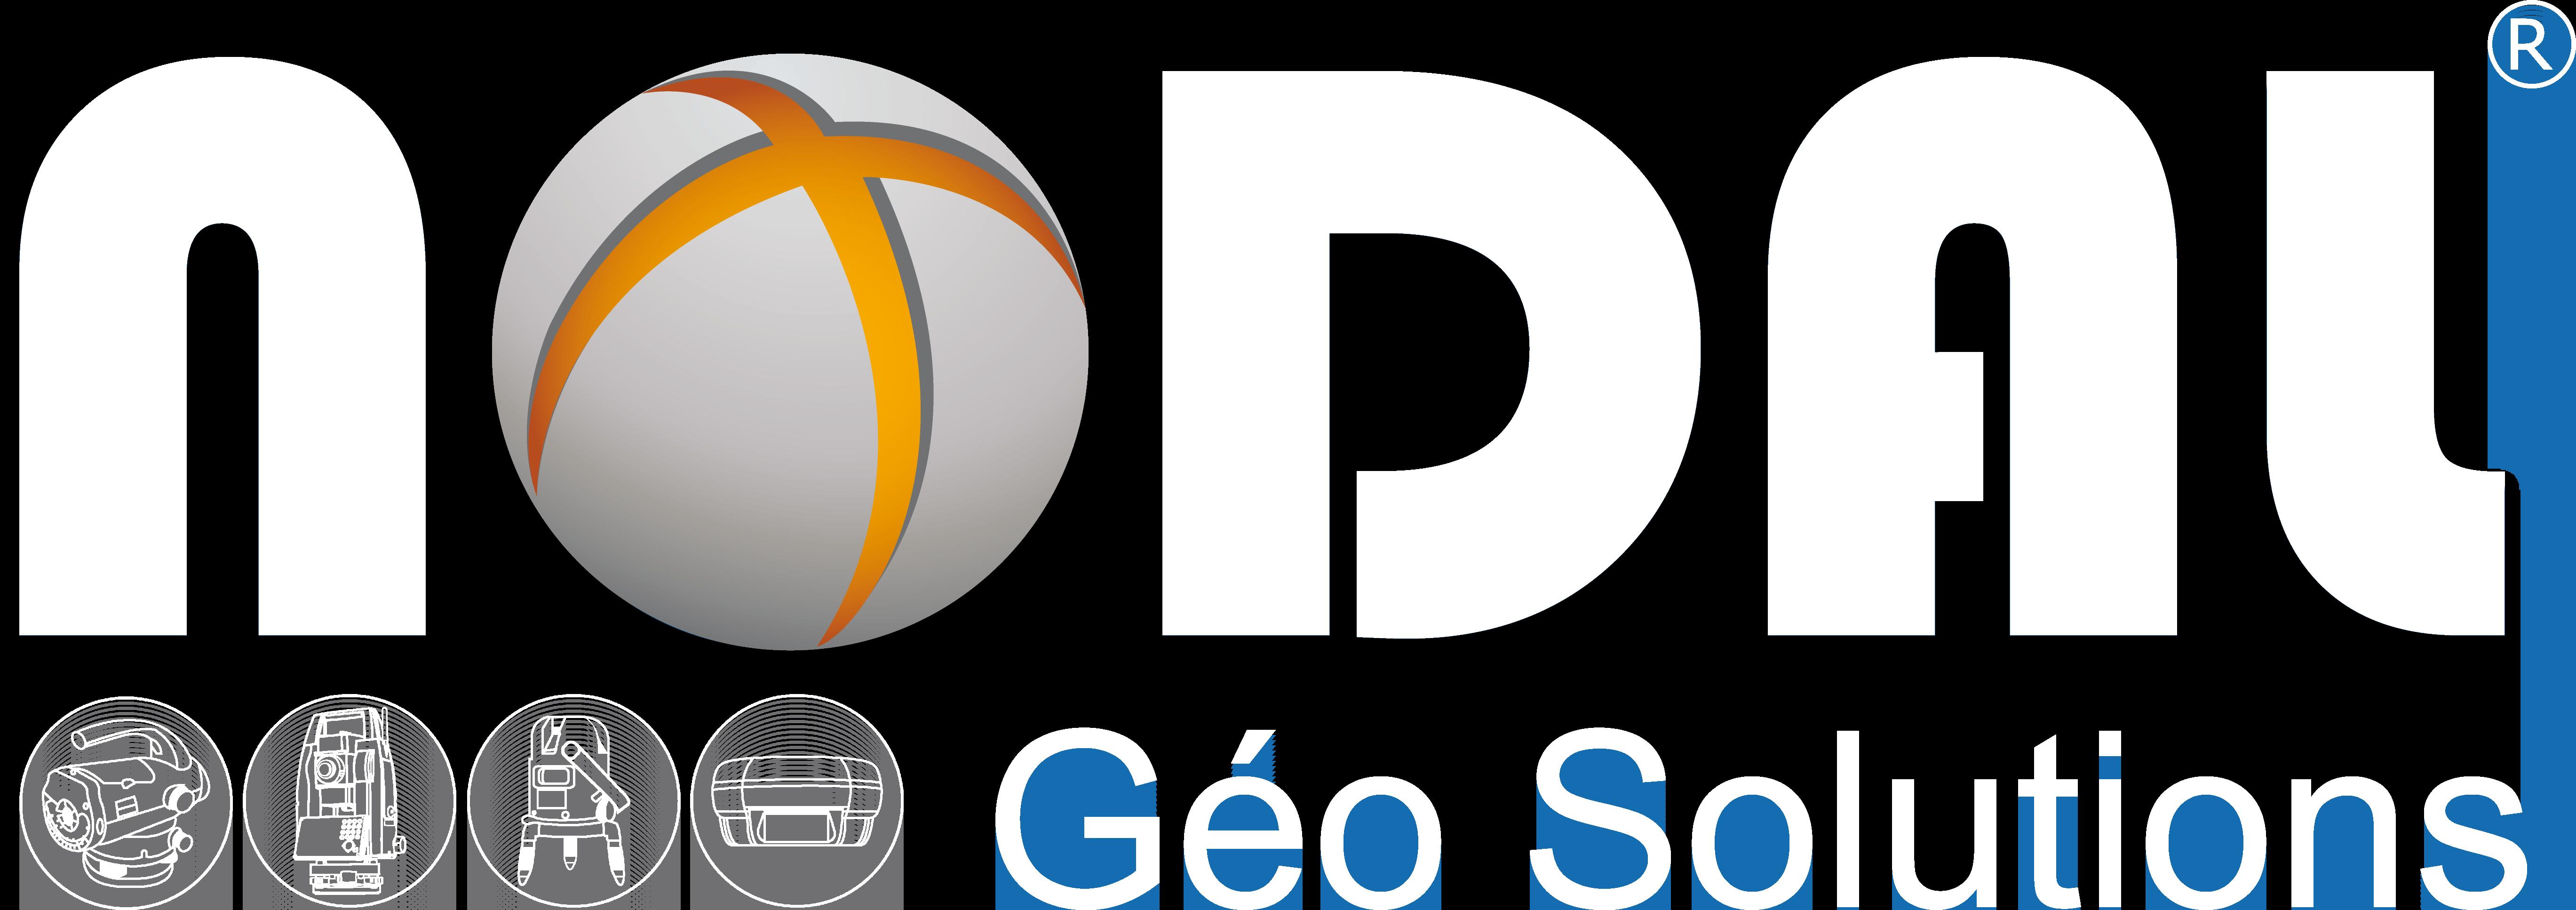 Nodal Geo solutions